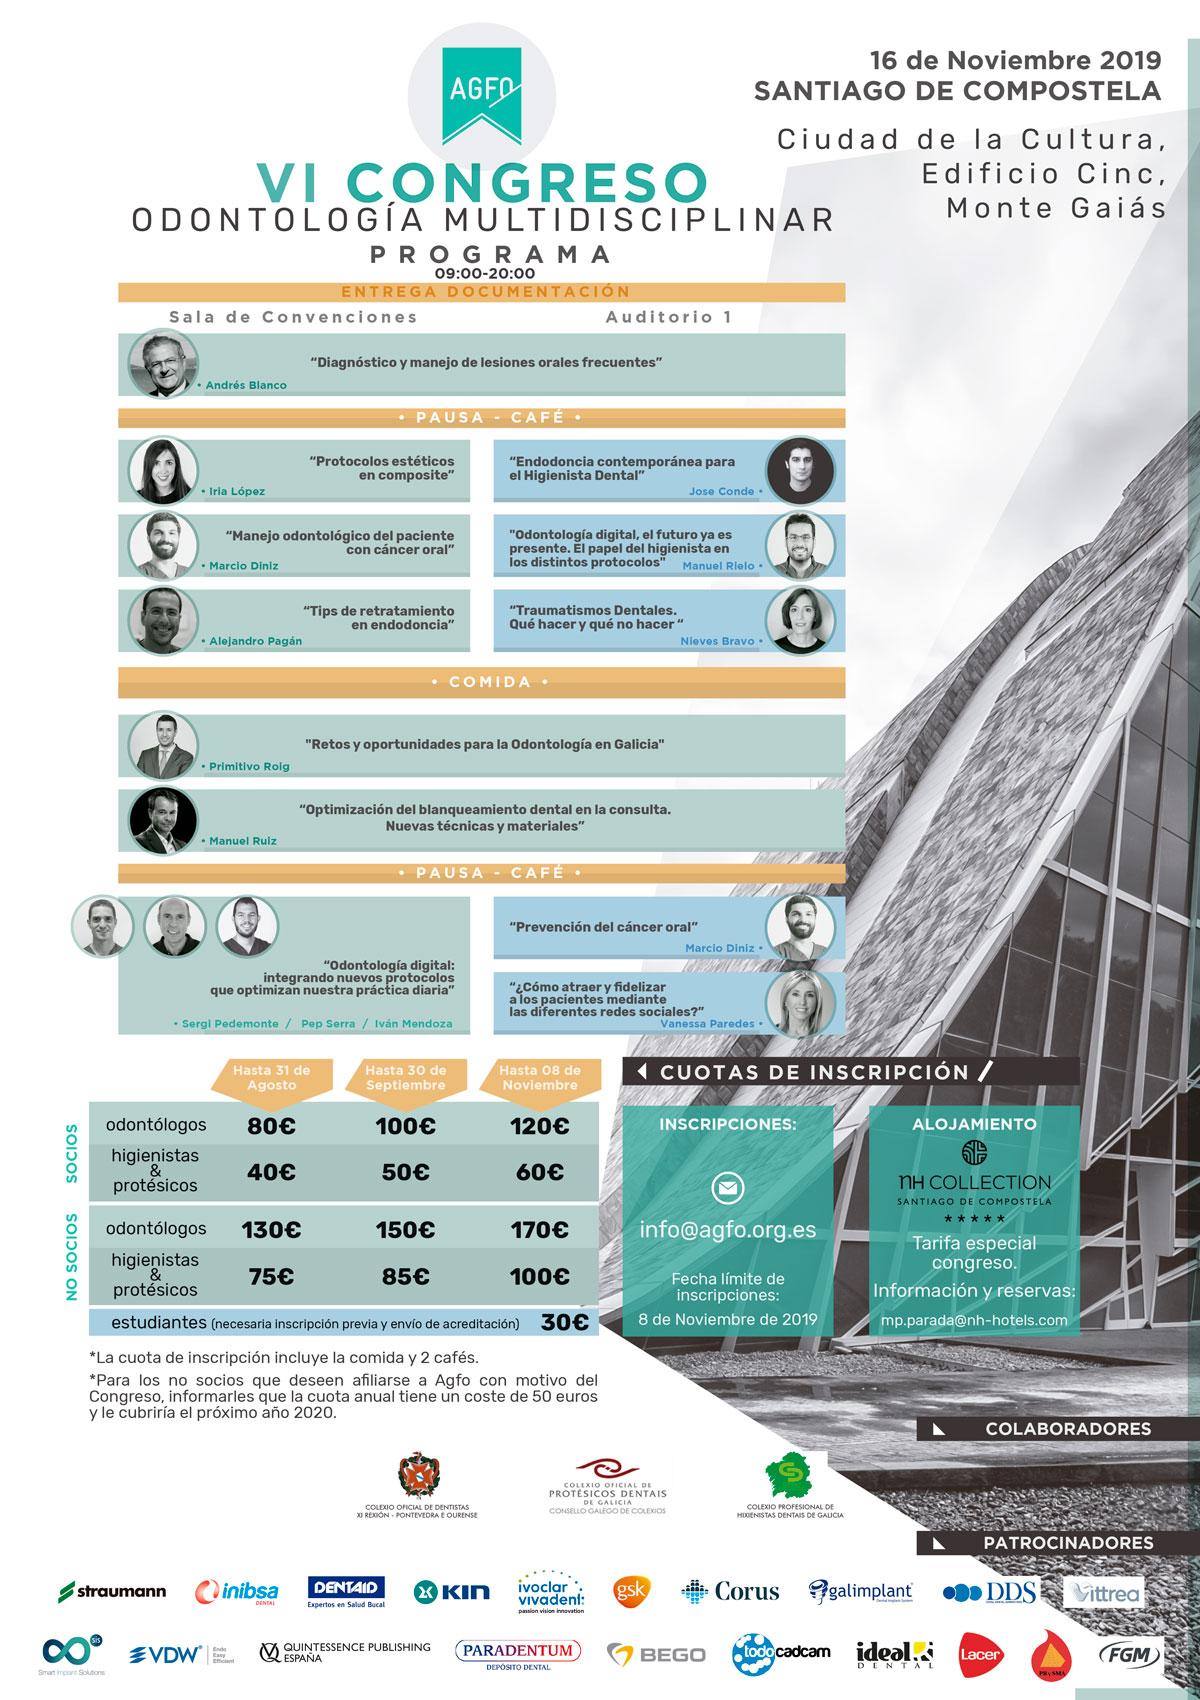 programa-congreso-dontologia-multidisciplinar-galicia